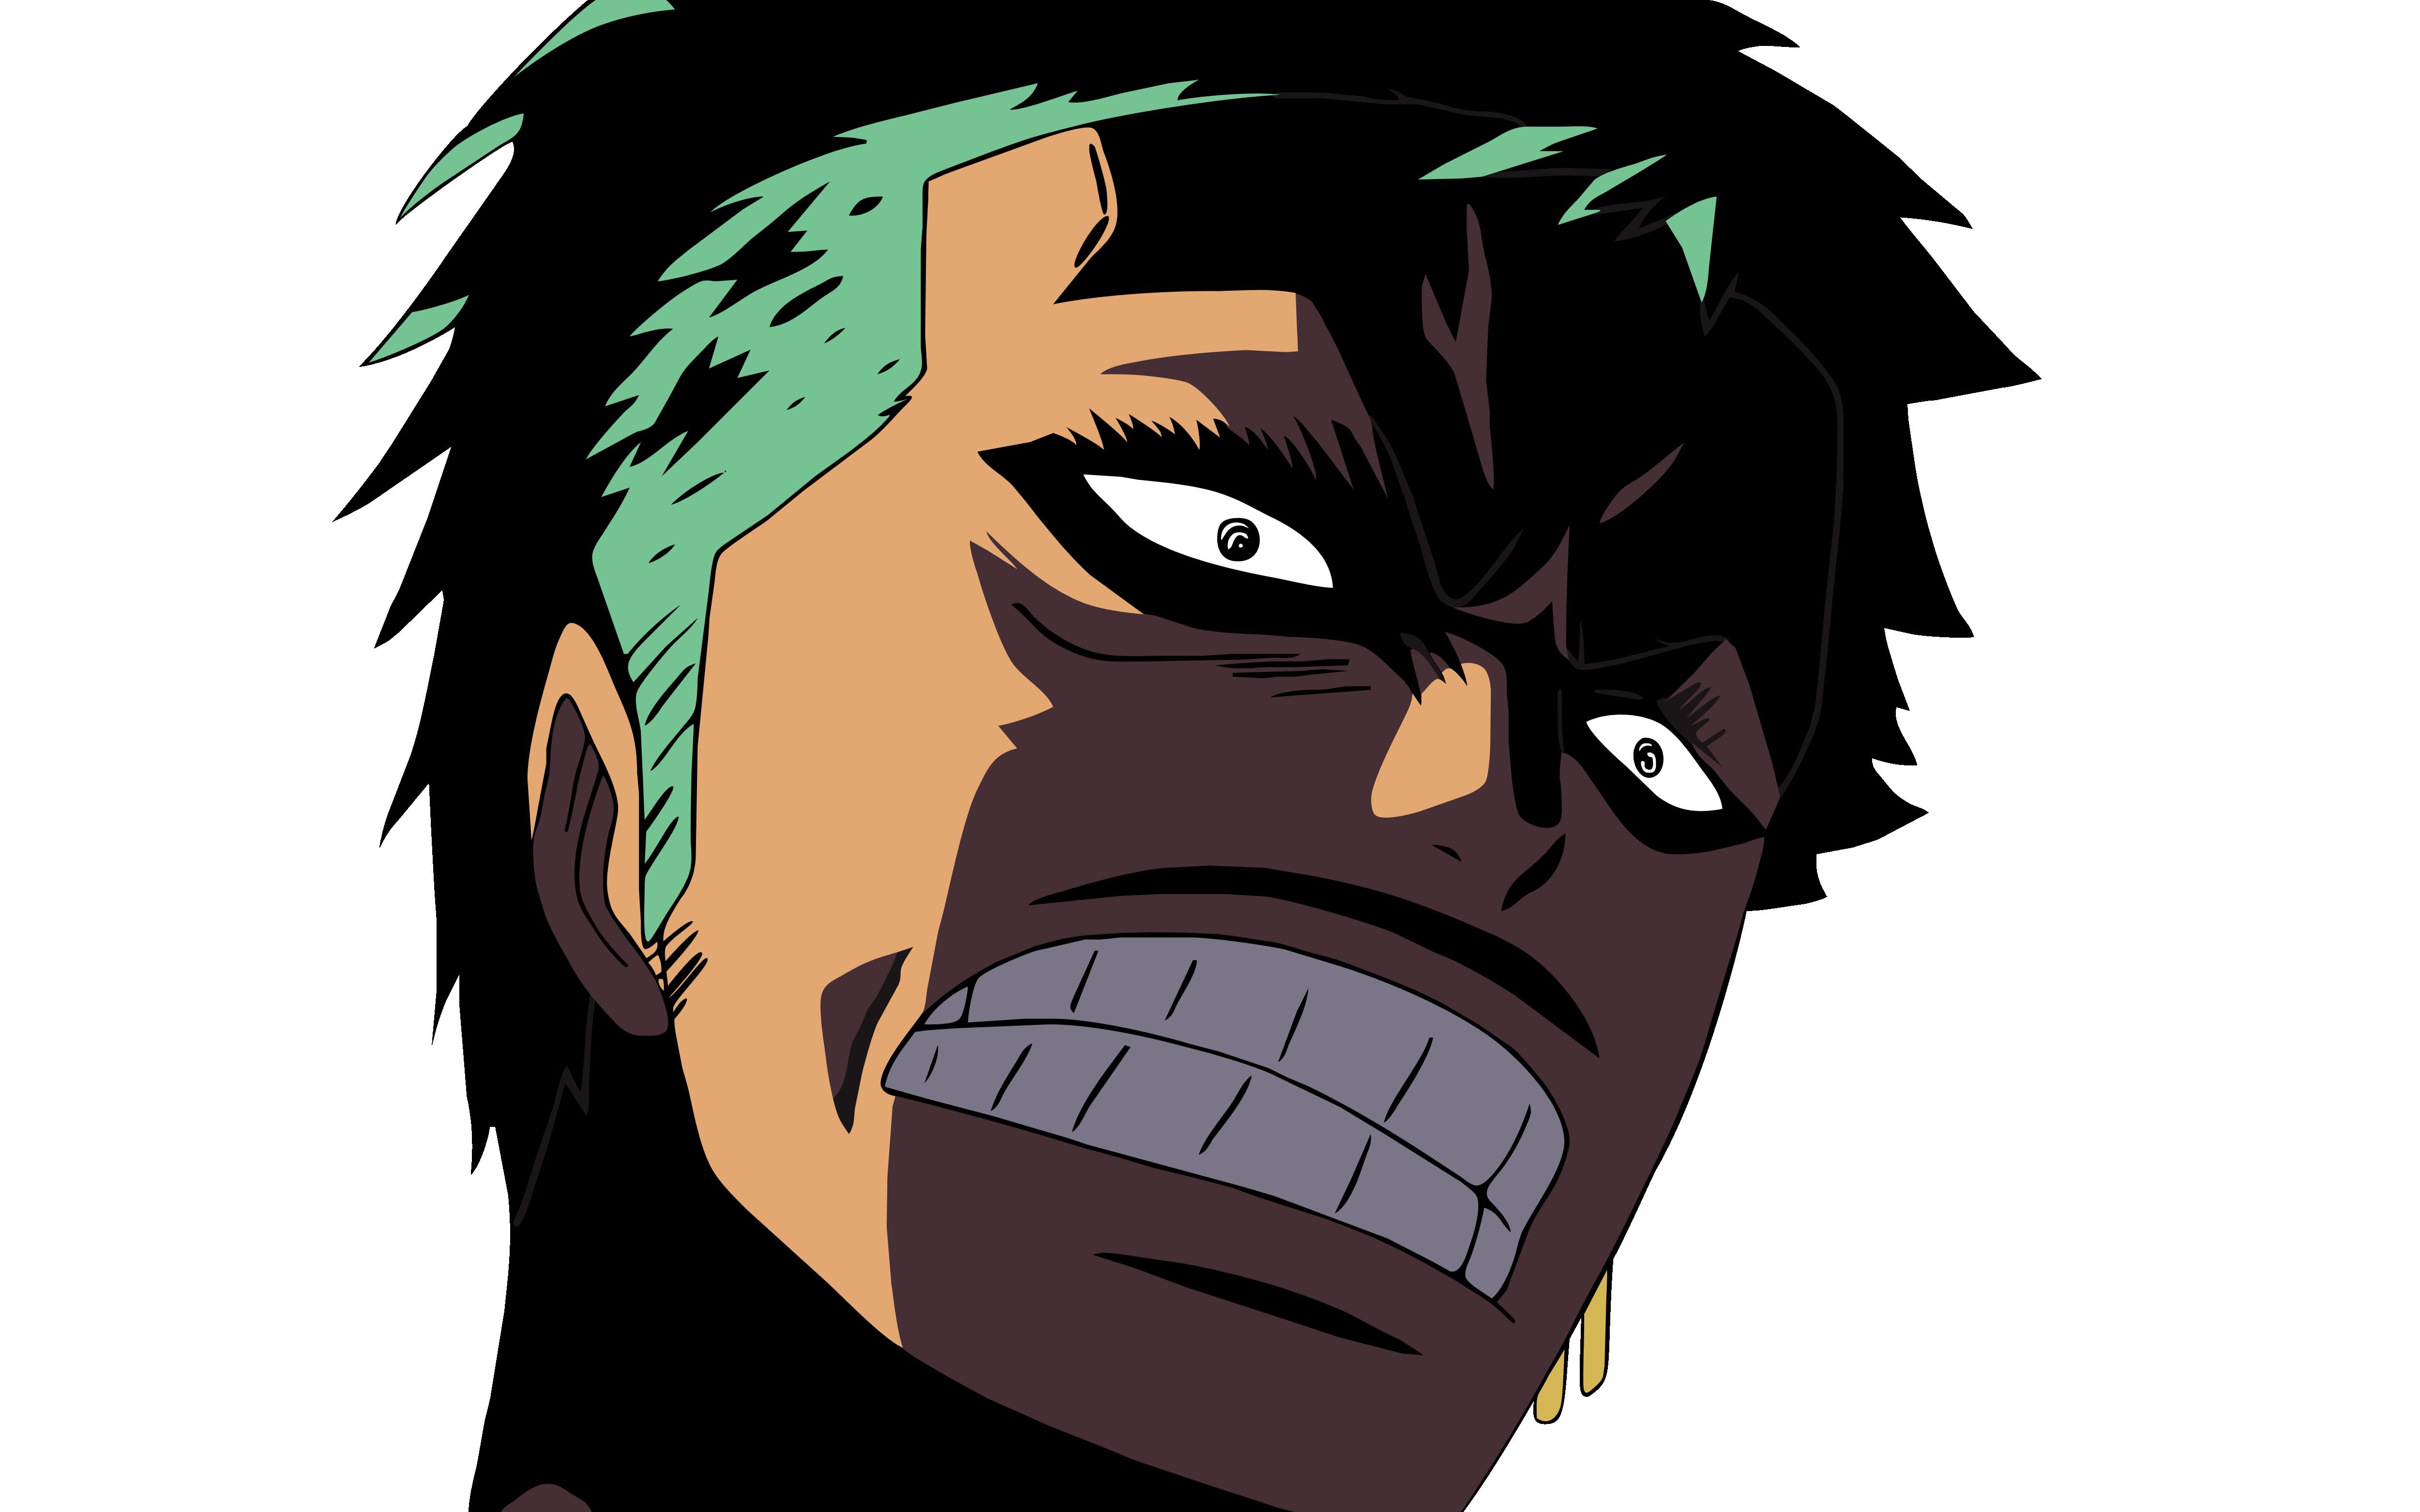 One Piece Anime Roronoa Zoro Wallpaper Resolution 5000x3125 Id 88790 Wallha Com